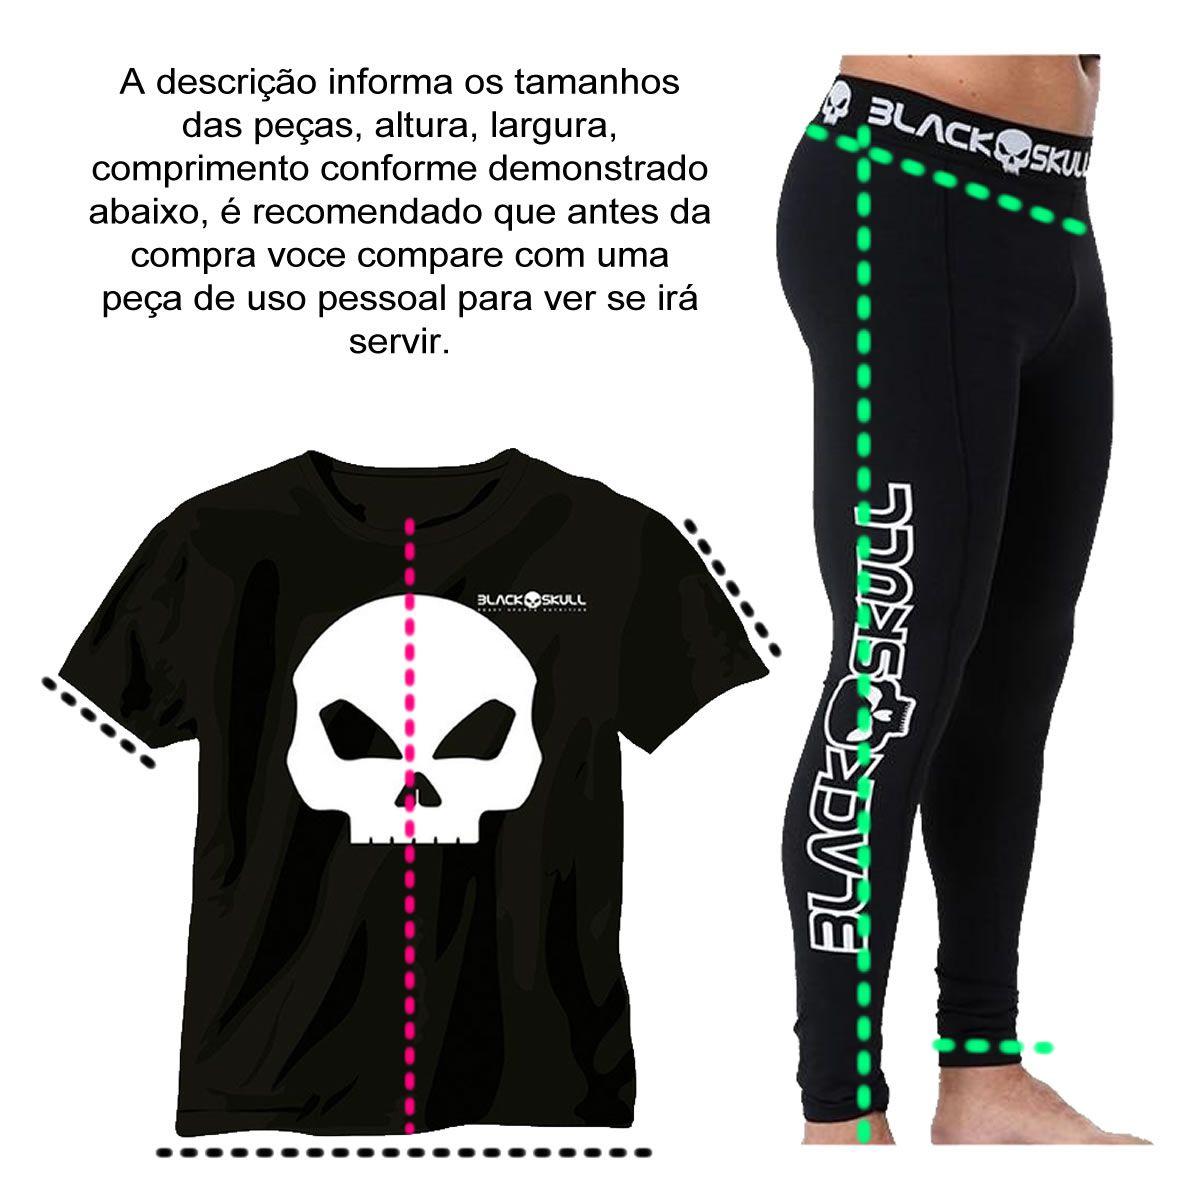 Camiseta Bs Rr Preto - Black Skull